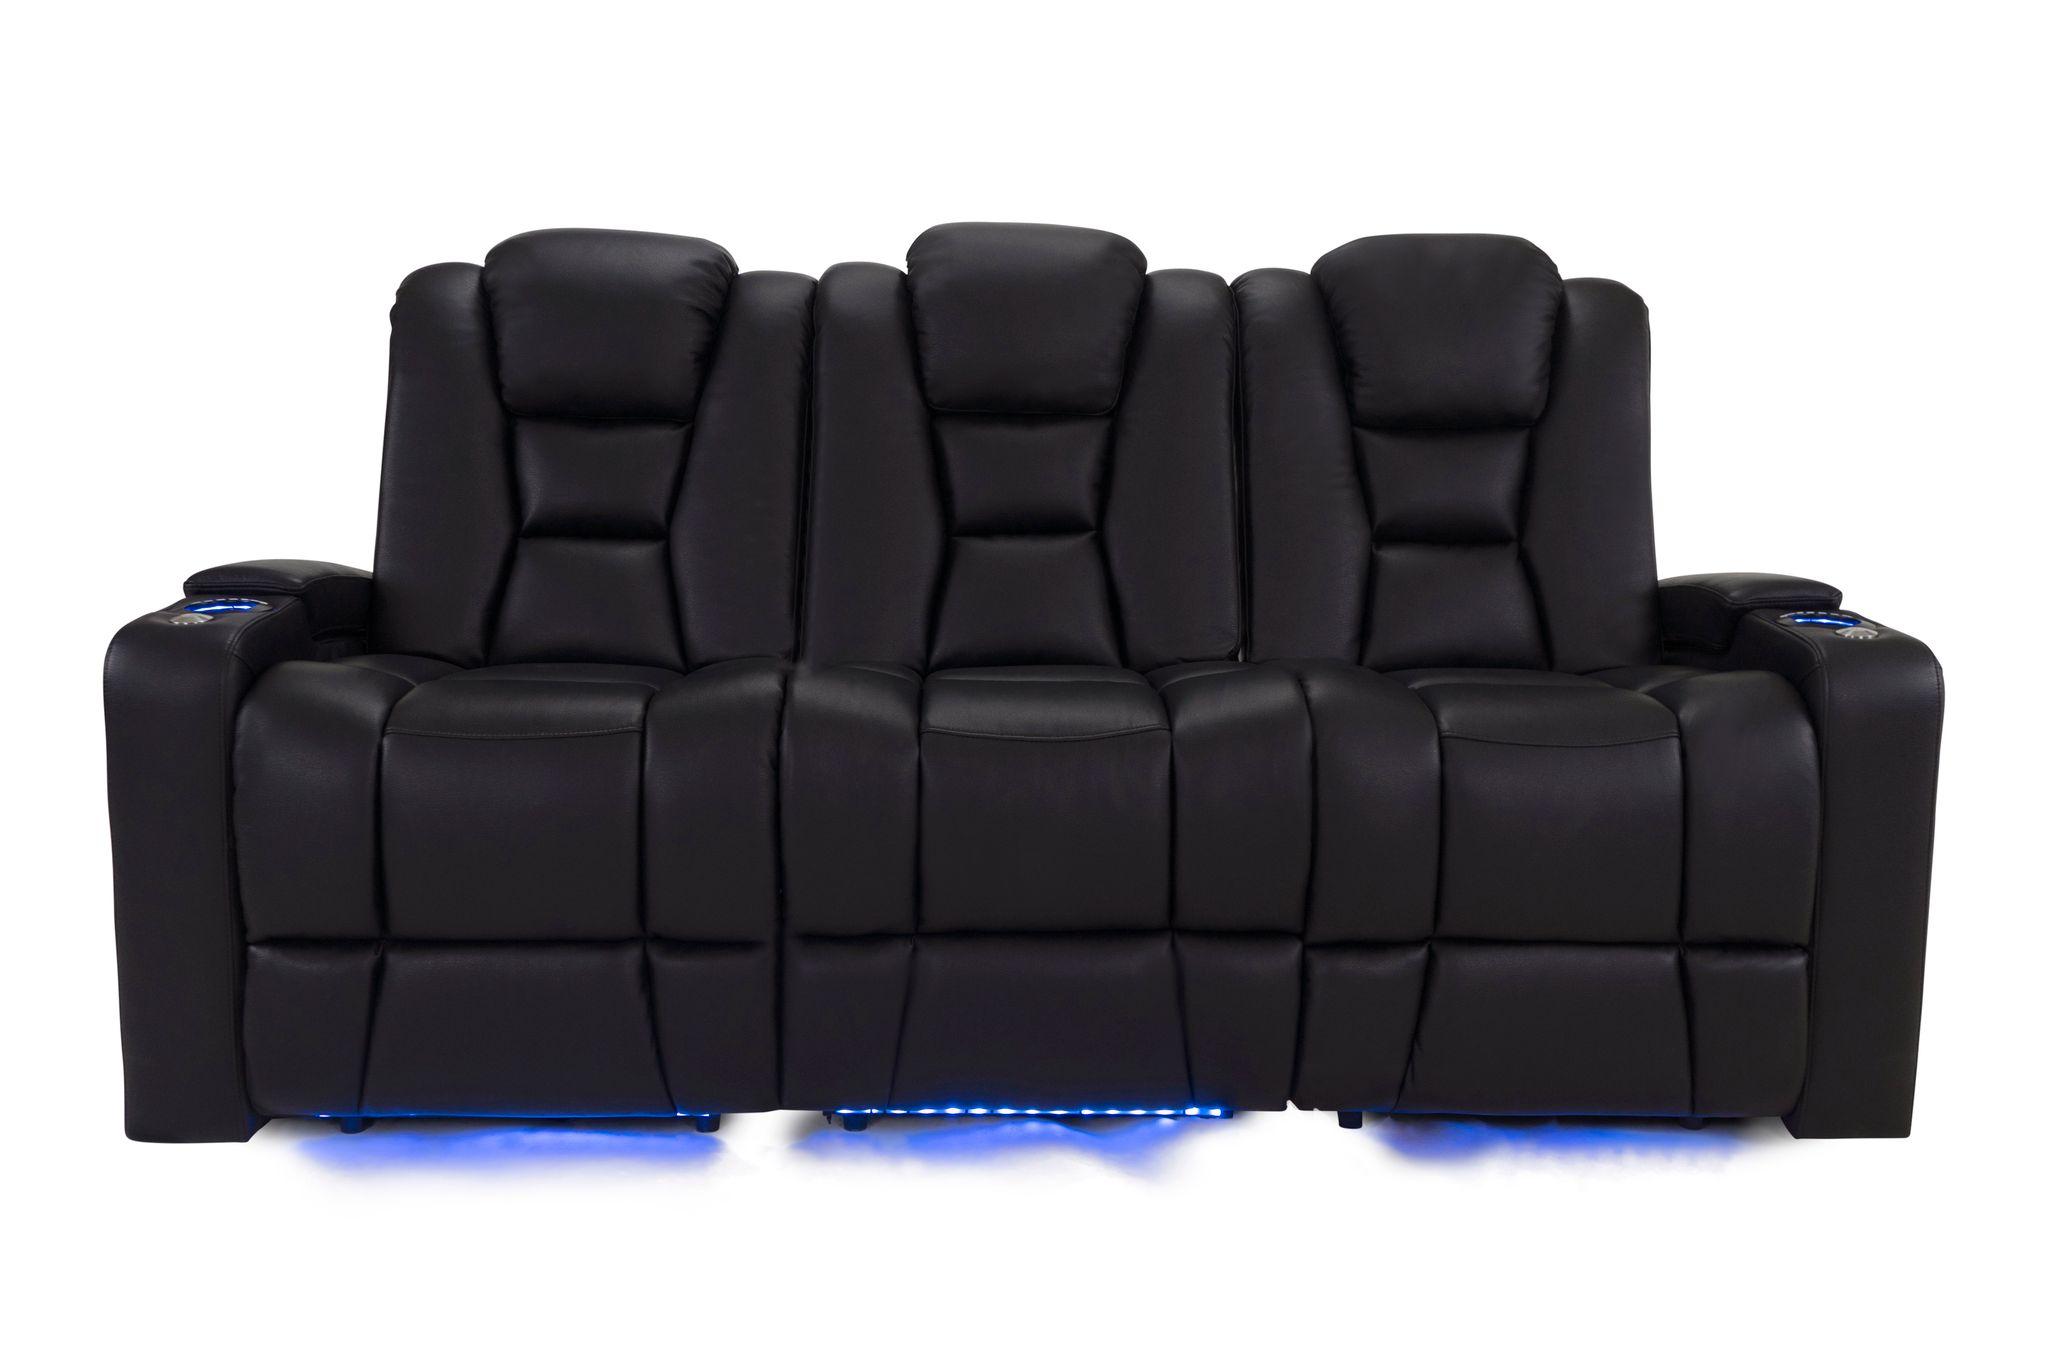 Revolution RowOne Seating